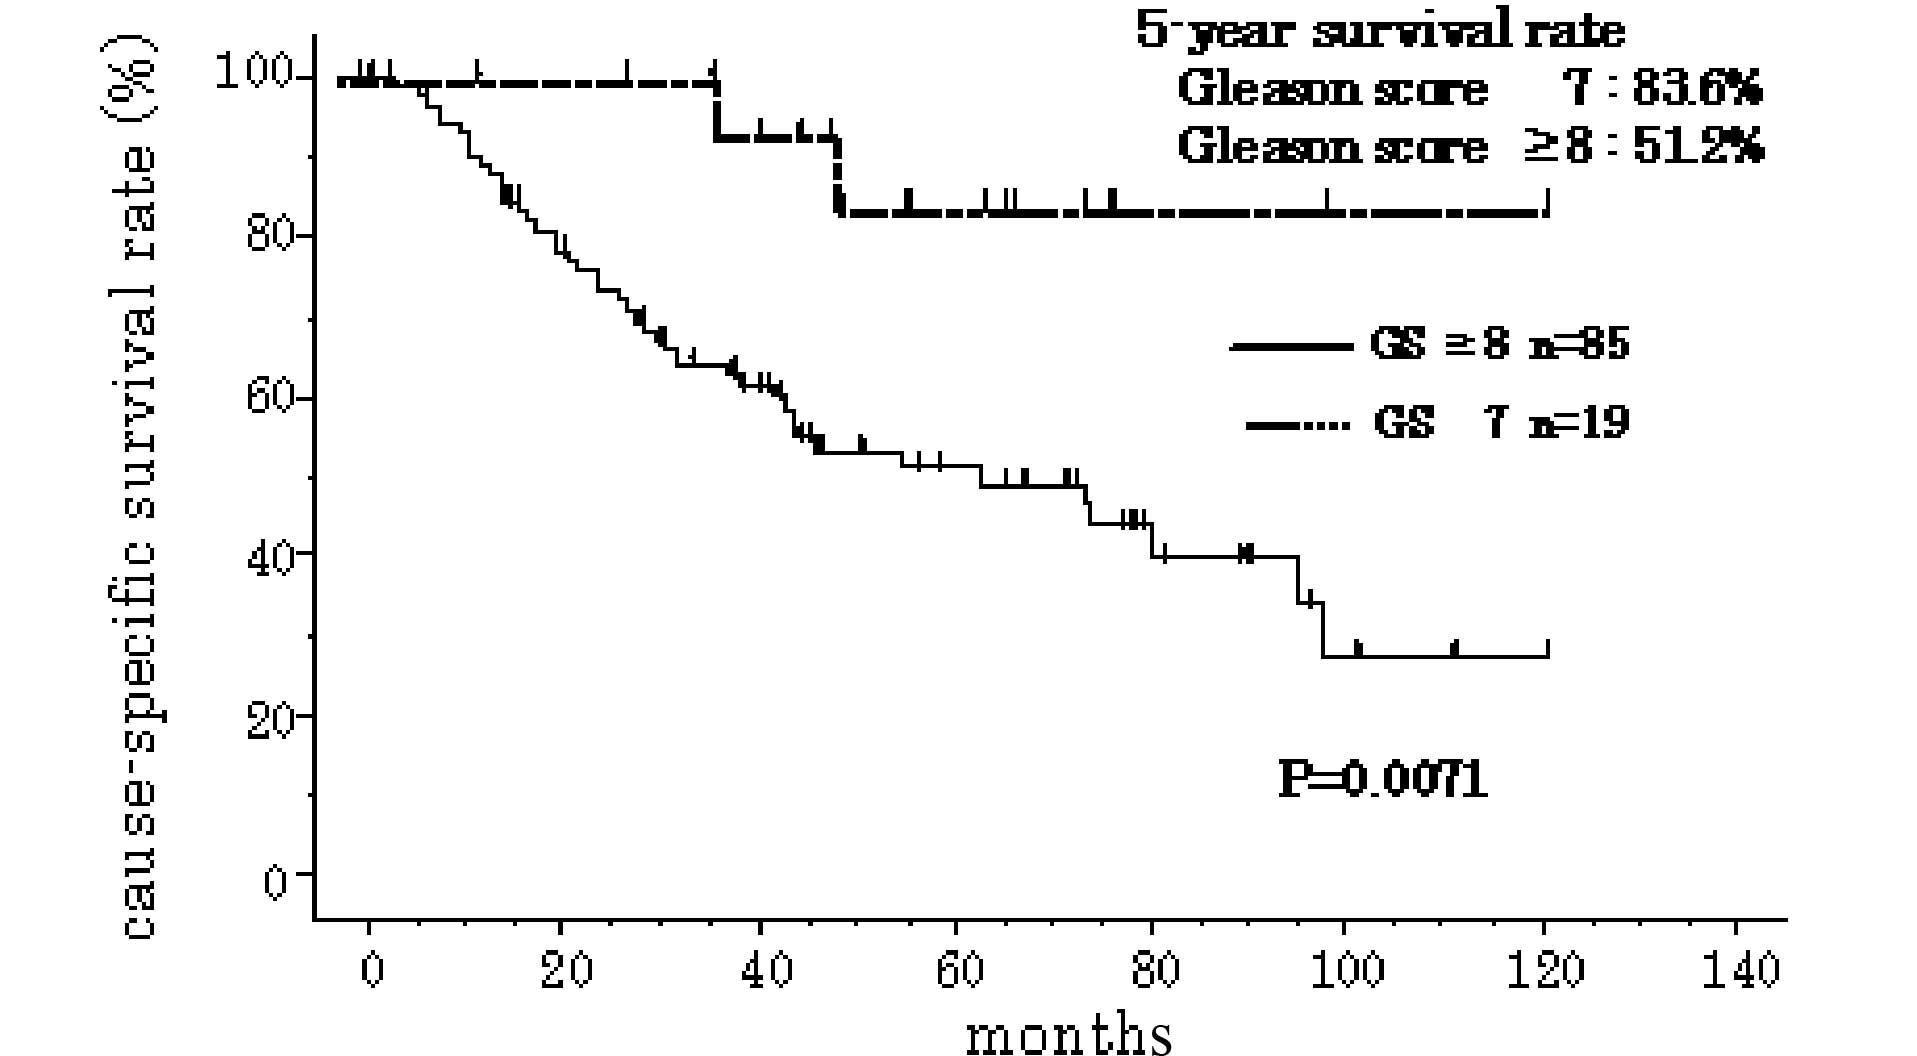 prostate cancer gleason score 6 treatment options